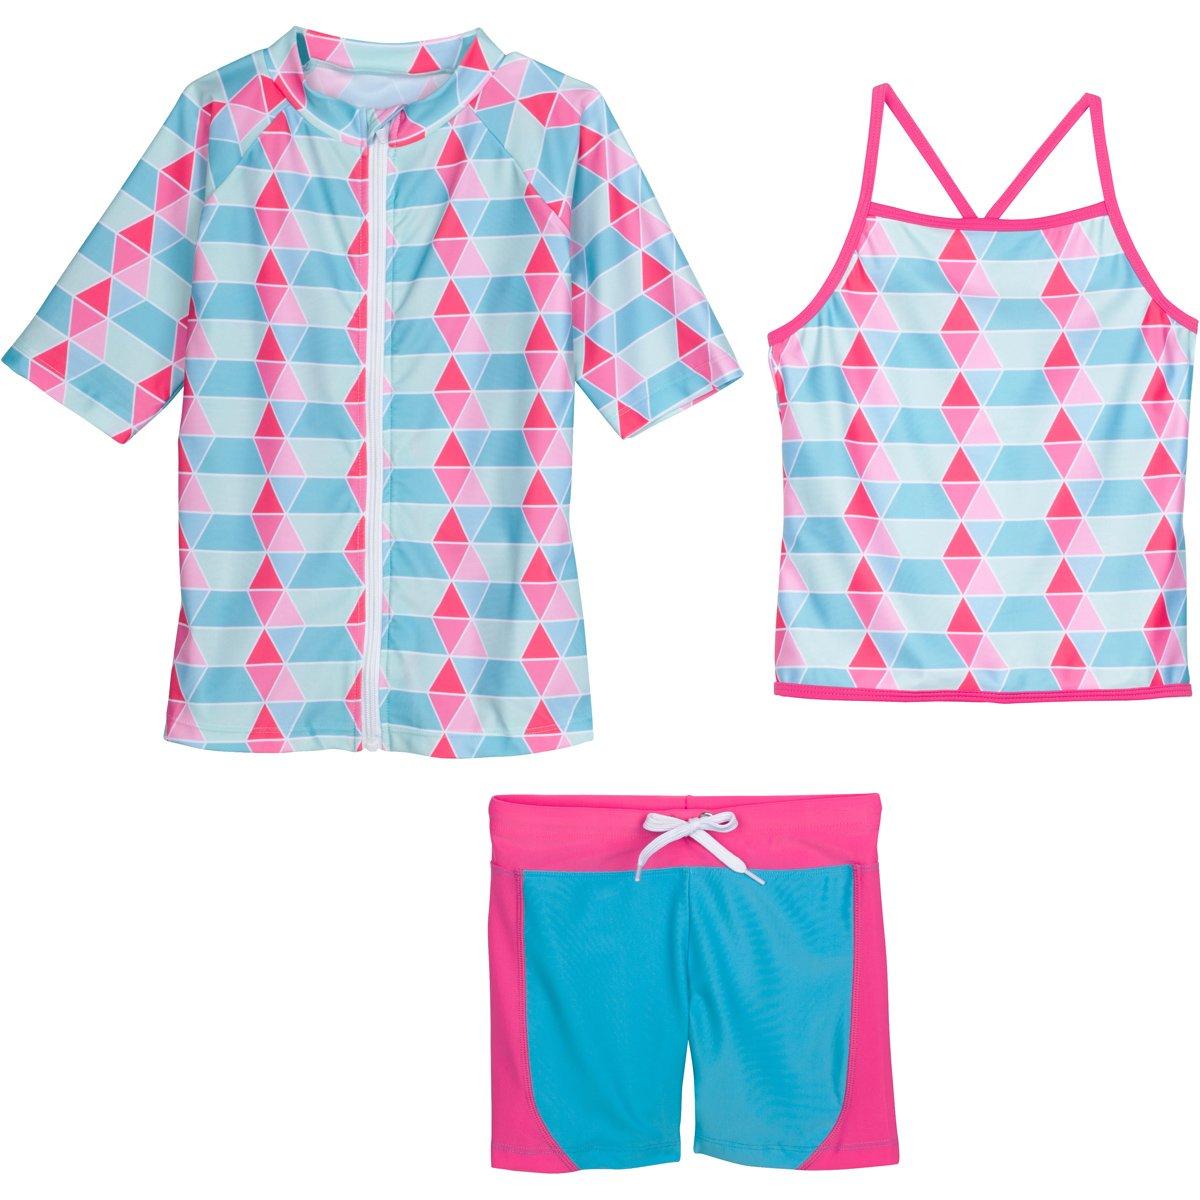 SwimZip Little Girls Short Sleeve Rash Guard Swim Shorts Set with UPF 50+ Blue Pool Party 4T